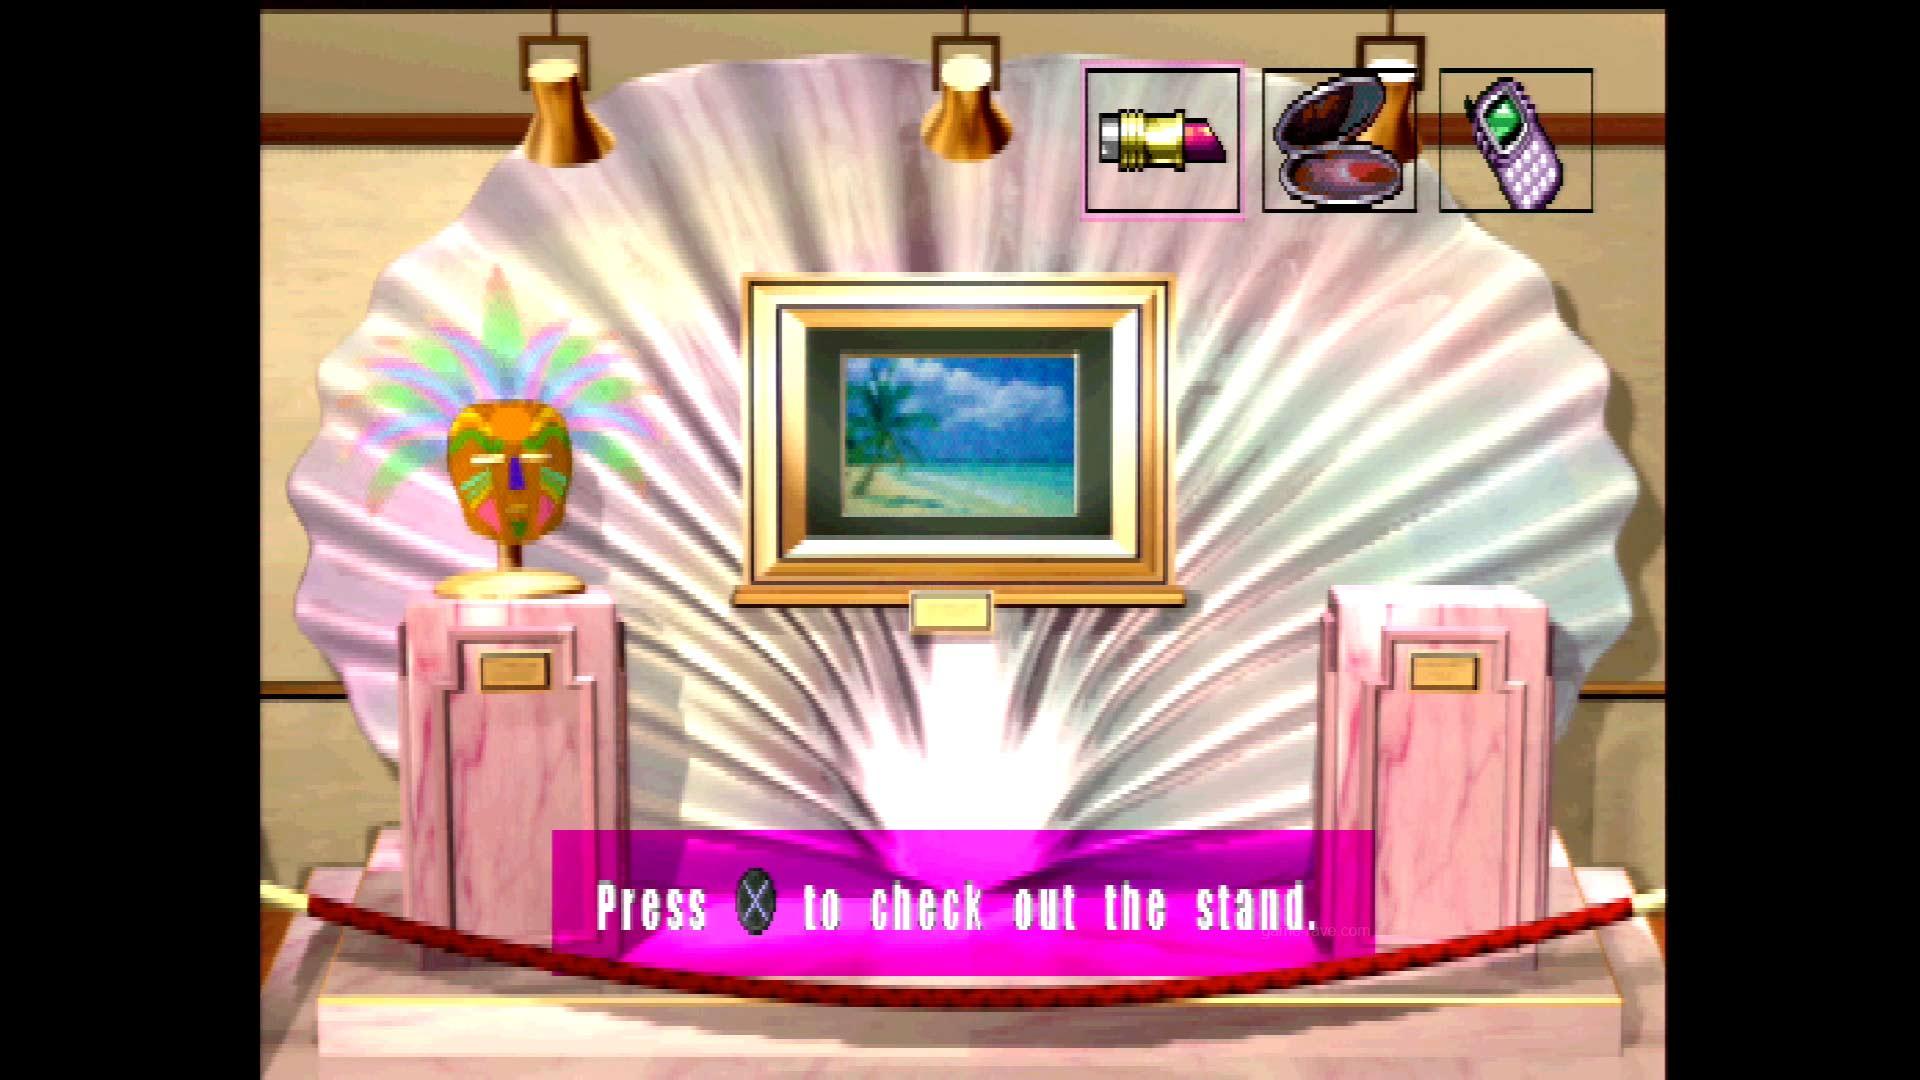 barbie detective Screen Shot 3_13_18, 10.25 PM 6